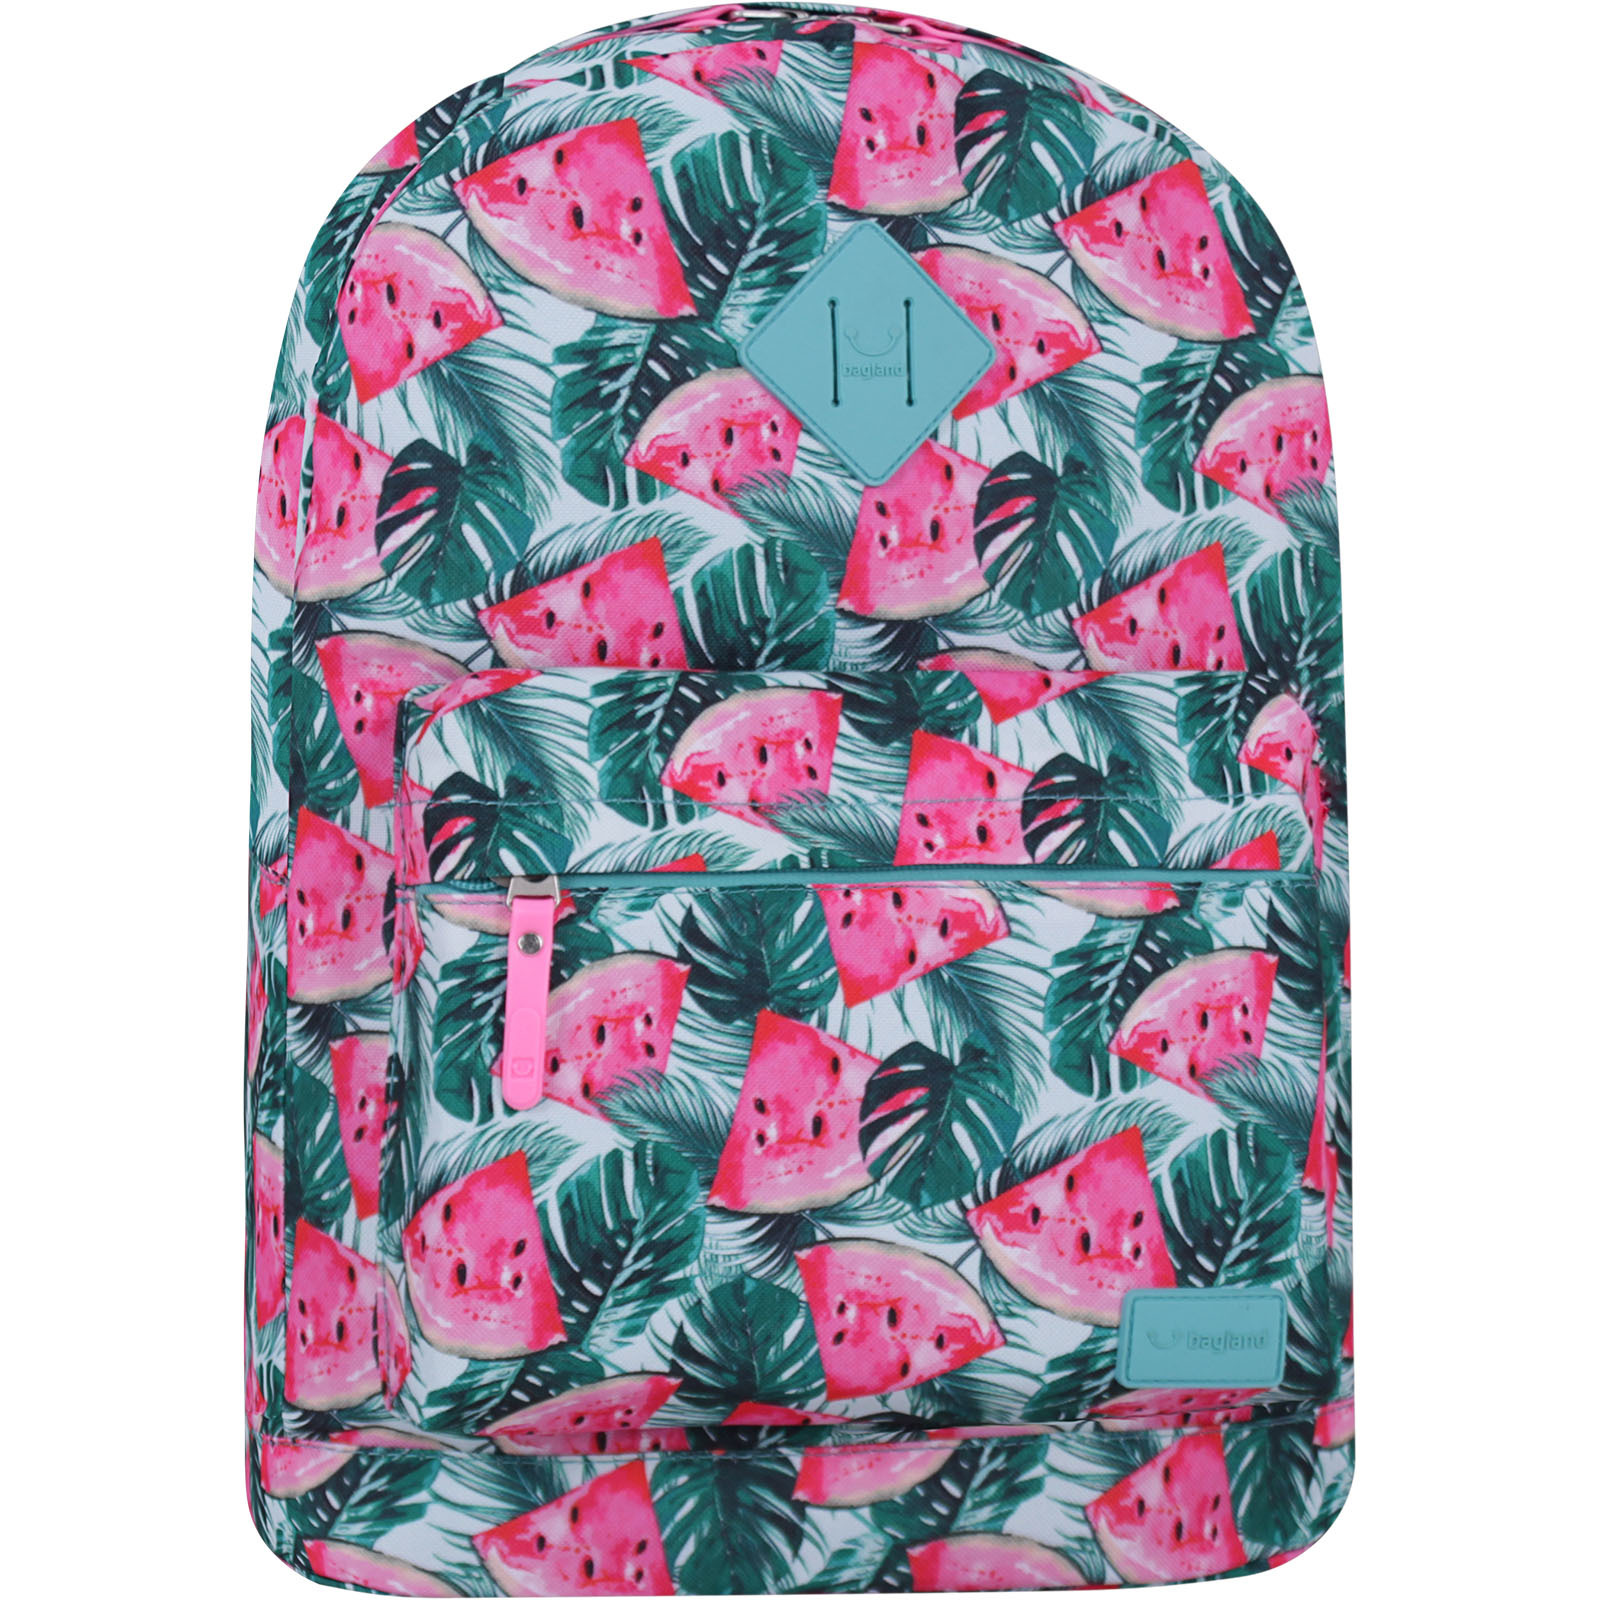 Городские рюкзаки Рюкзак Bagland Молодежный (дизайн) 17 л. сублимация 266 (00533664) IMG_9356_суб.266_.jpg